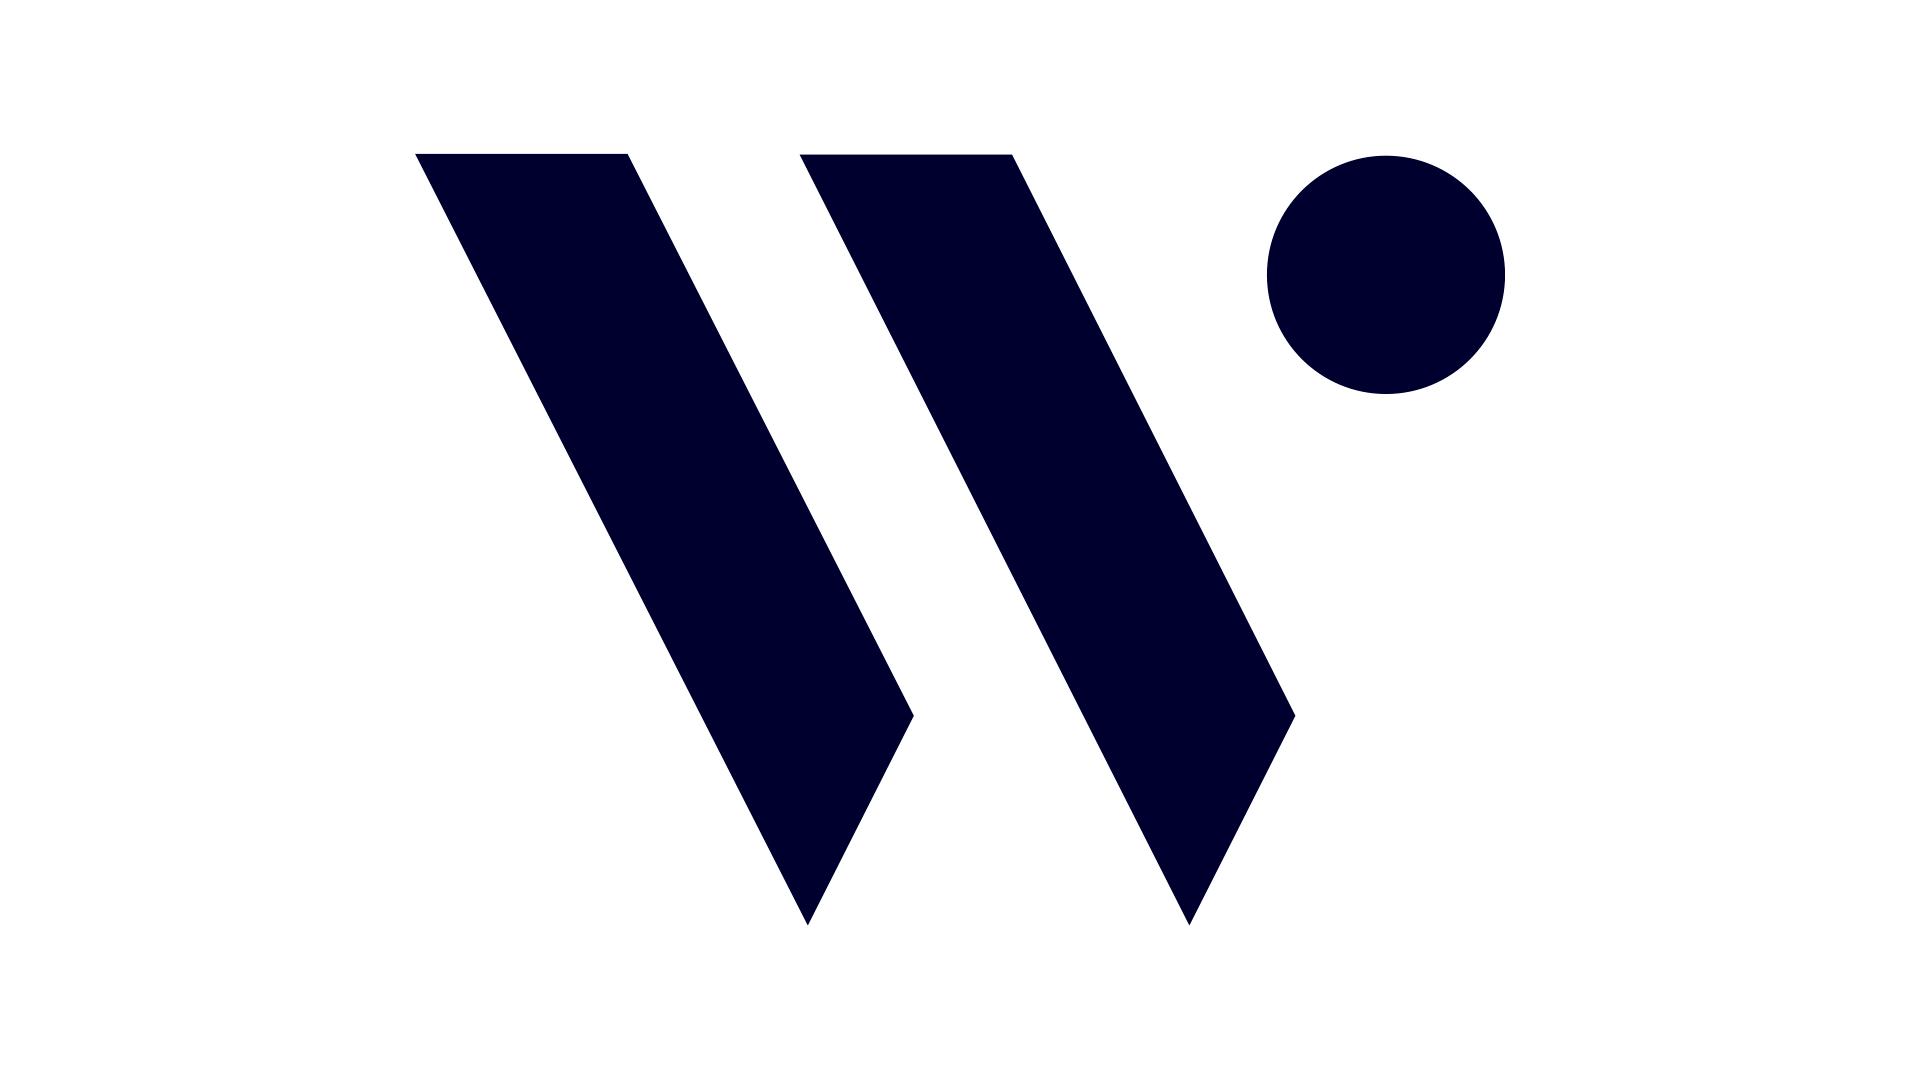 YourDesignMark-WineWorld-03